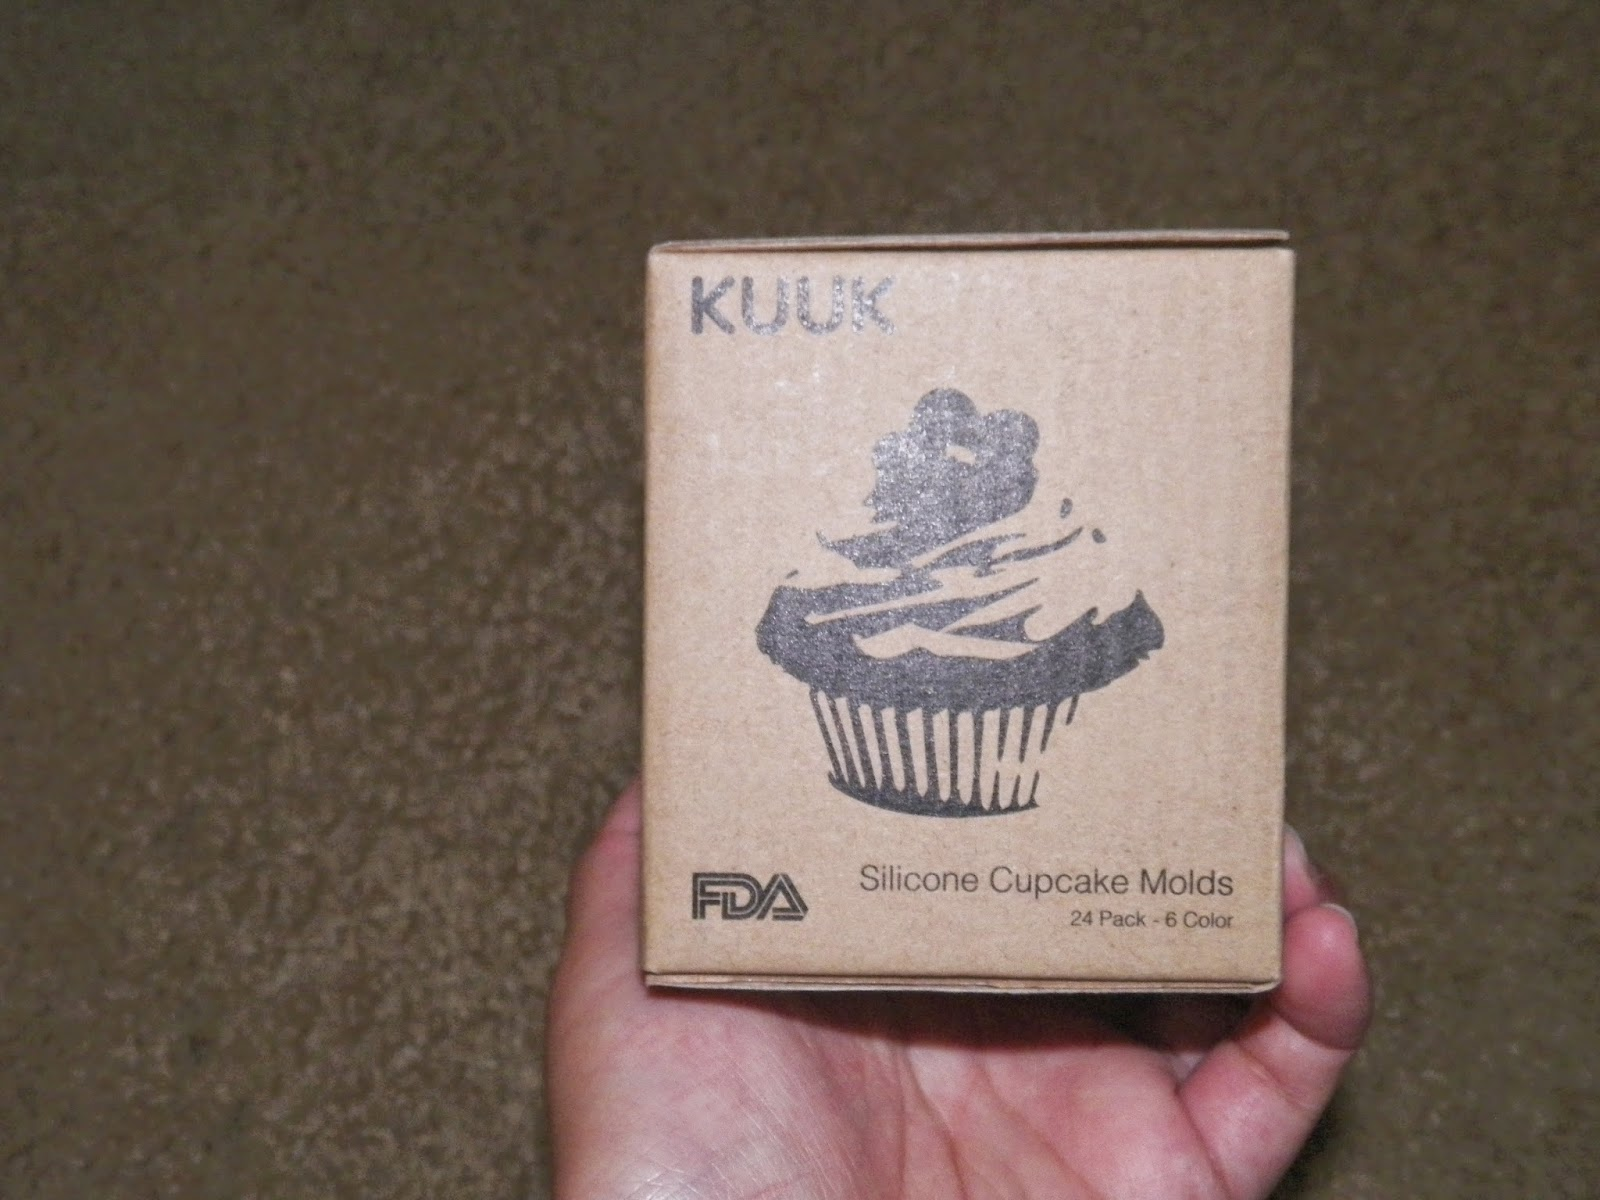 Kuuk_Silicone_Cupcake_Mold.jpg